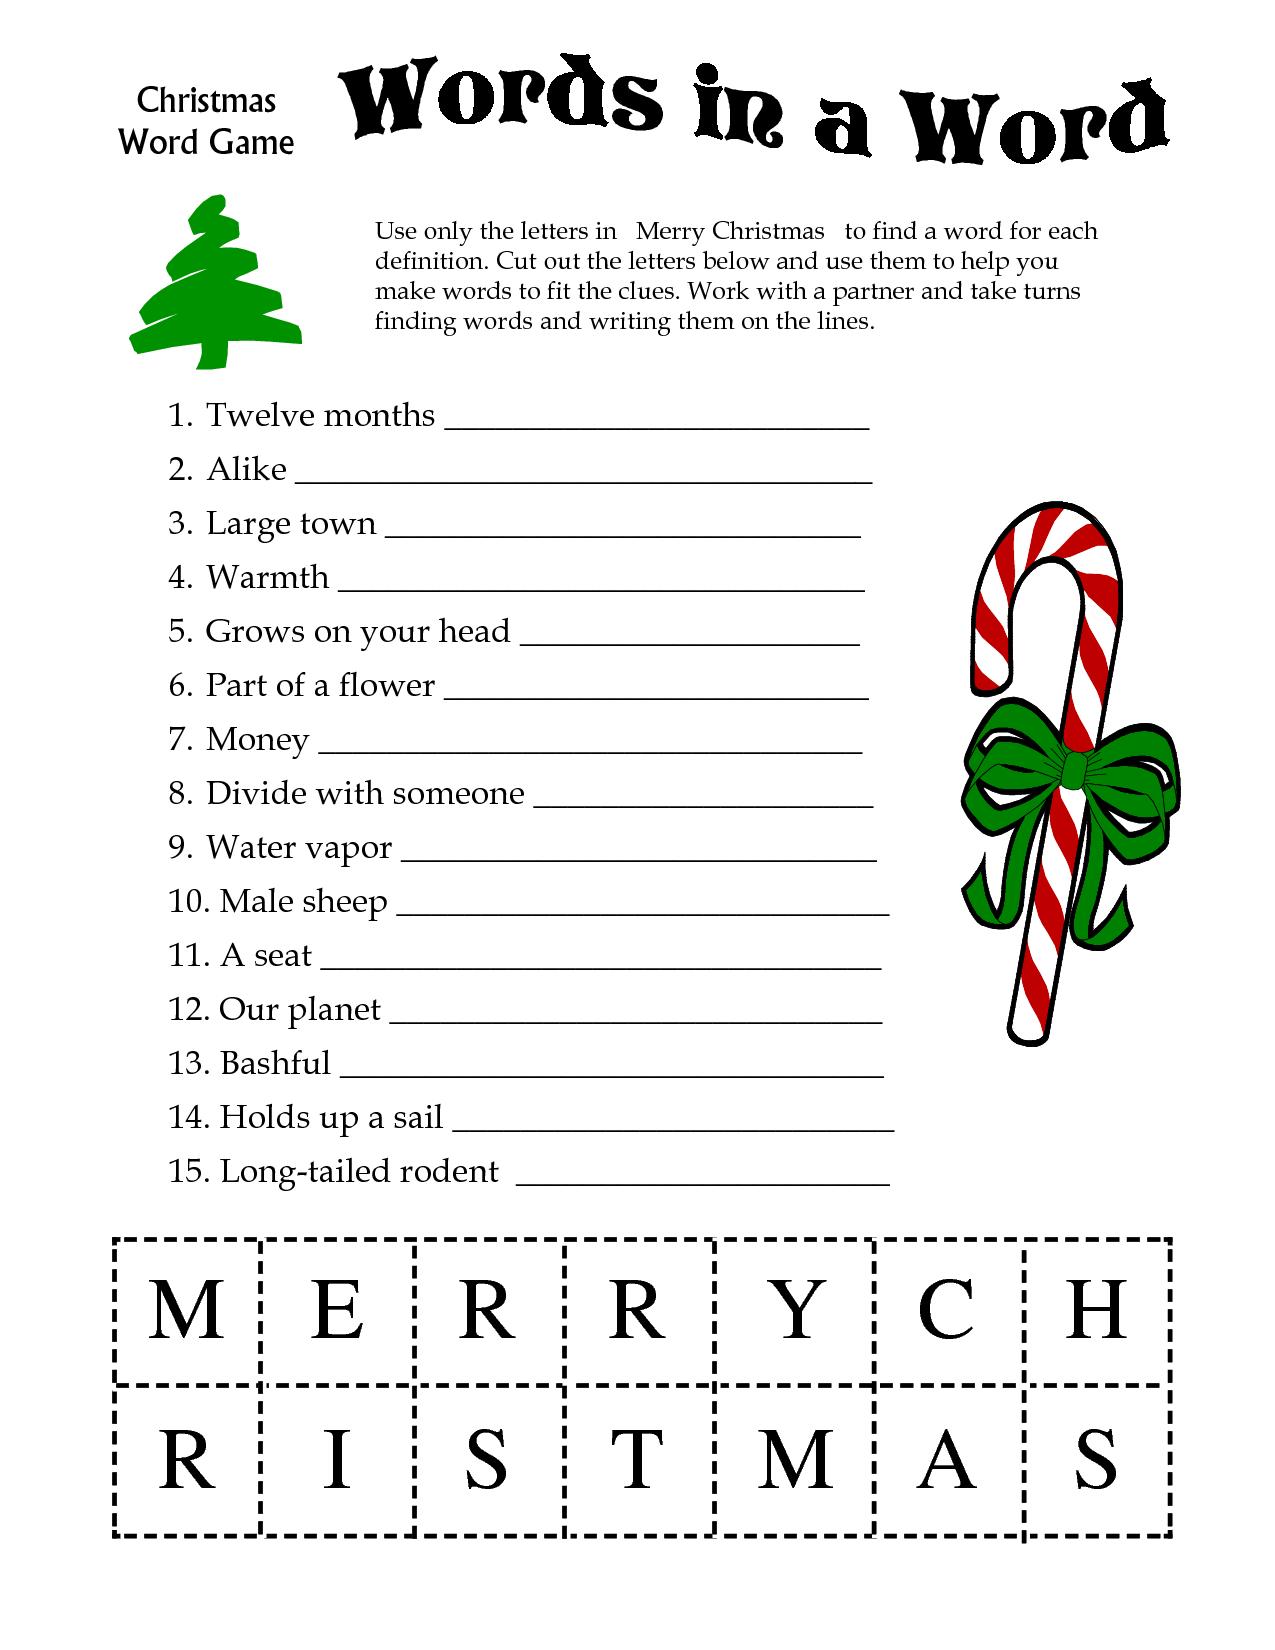 5 Images Of Free Printable Christmas Word Games | Printablee - Free Printable Christmas Games